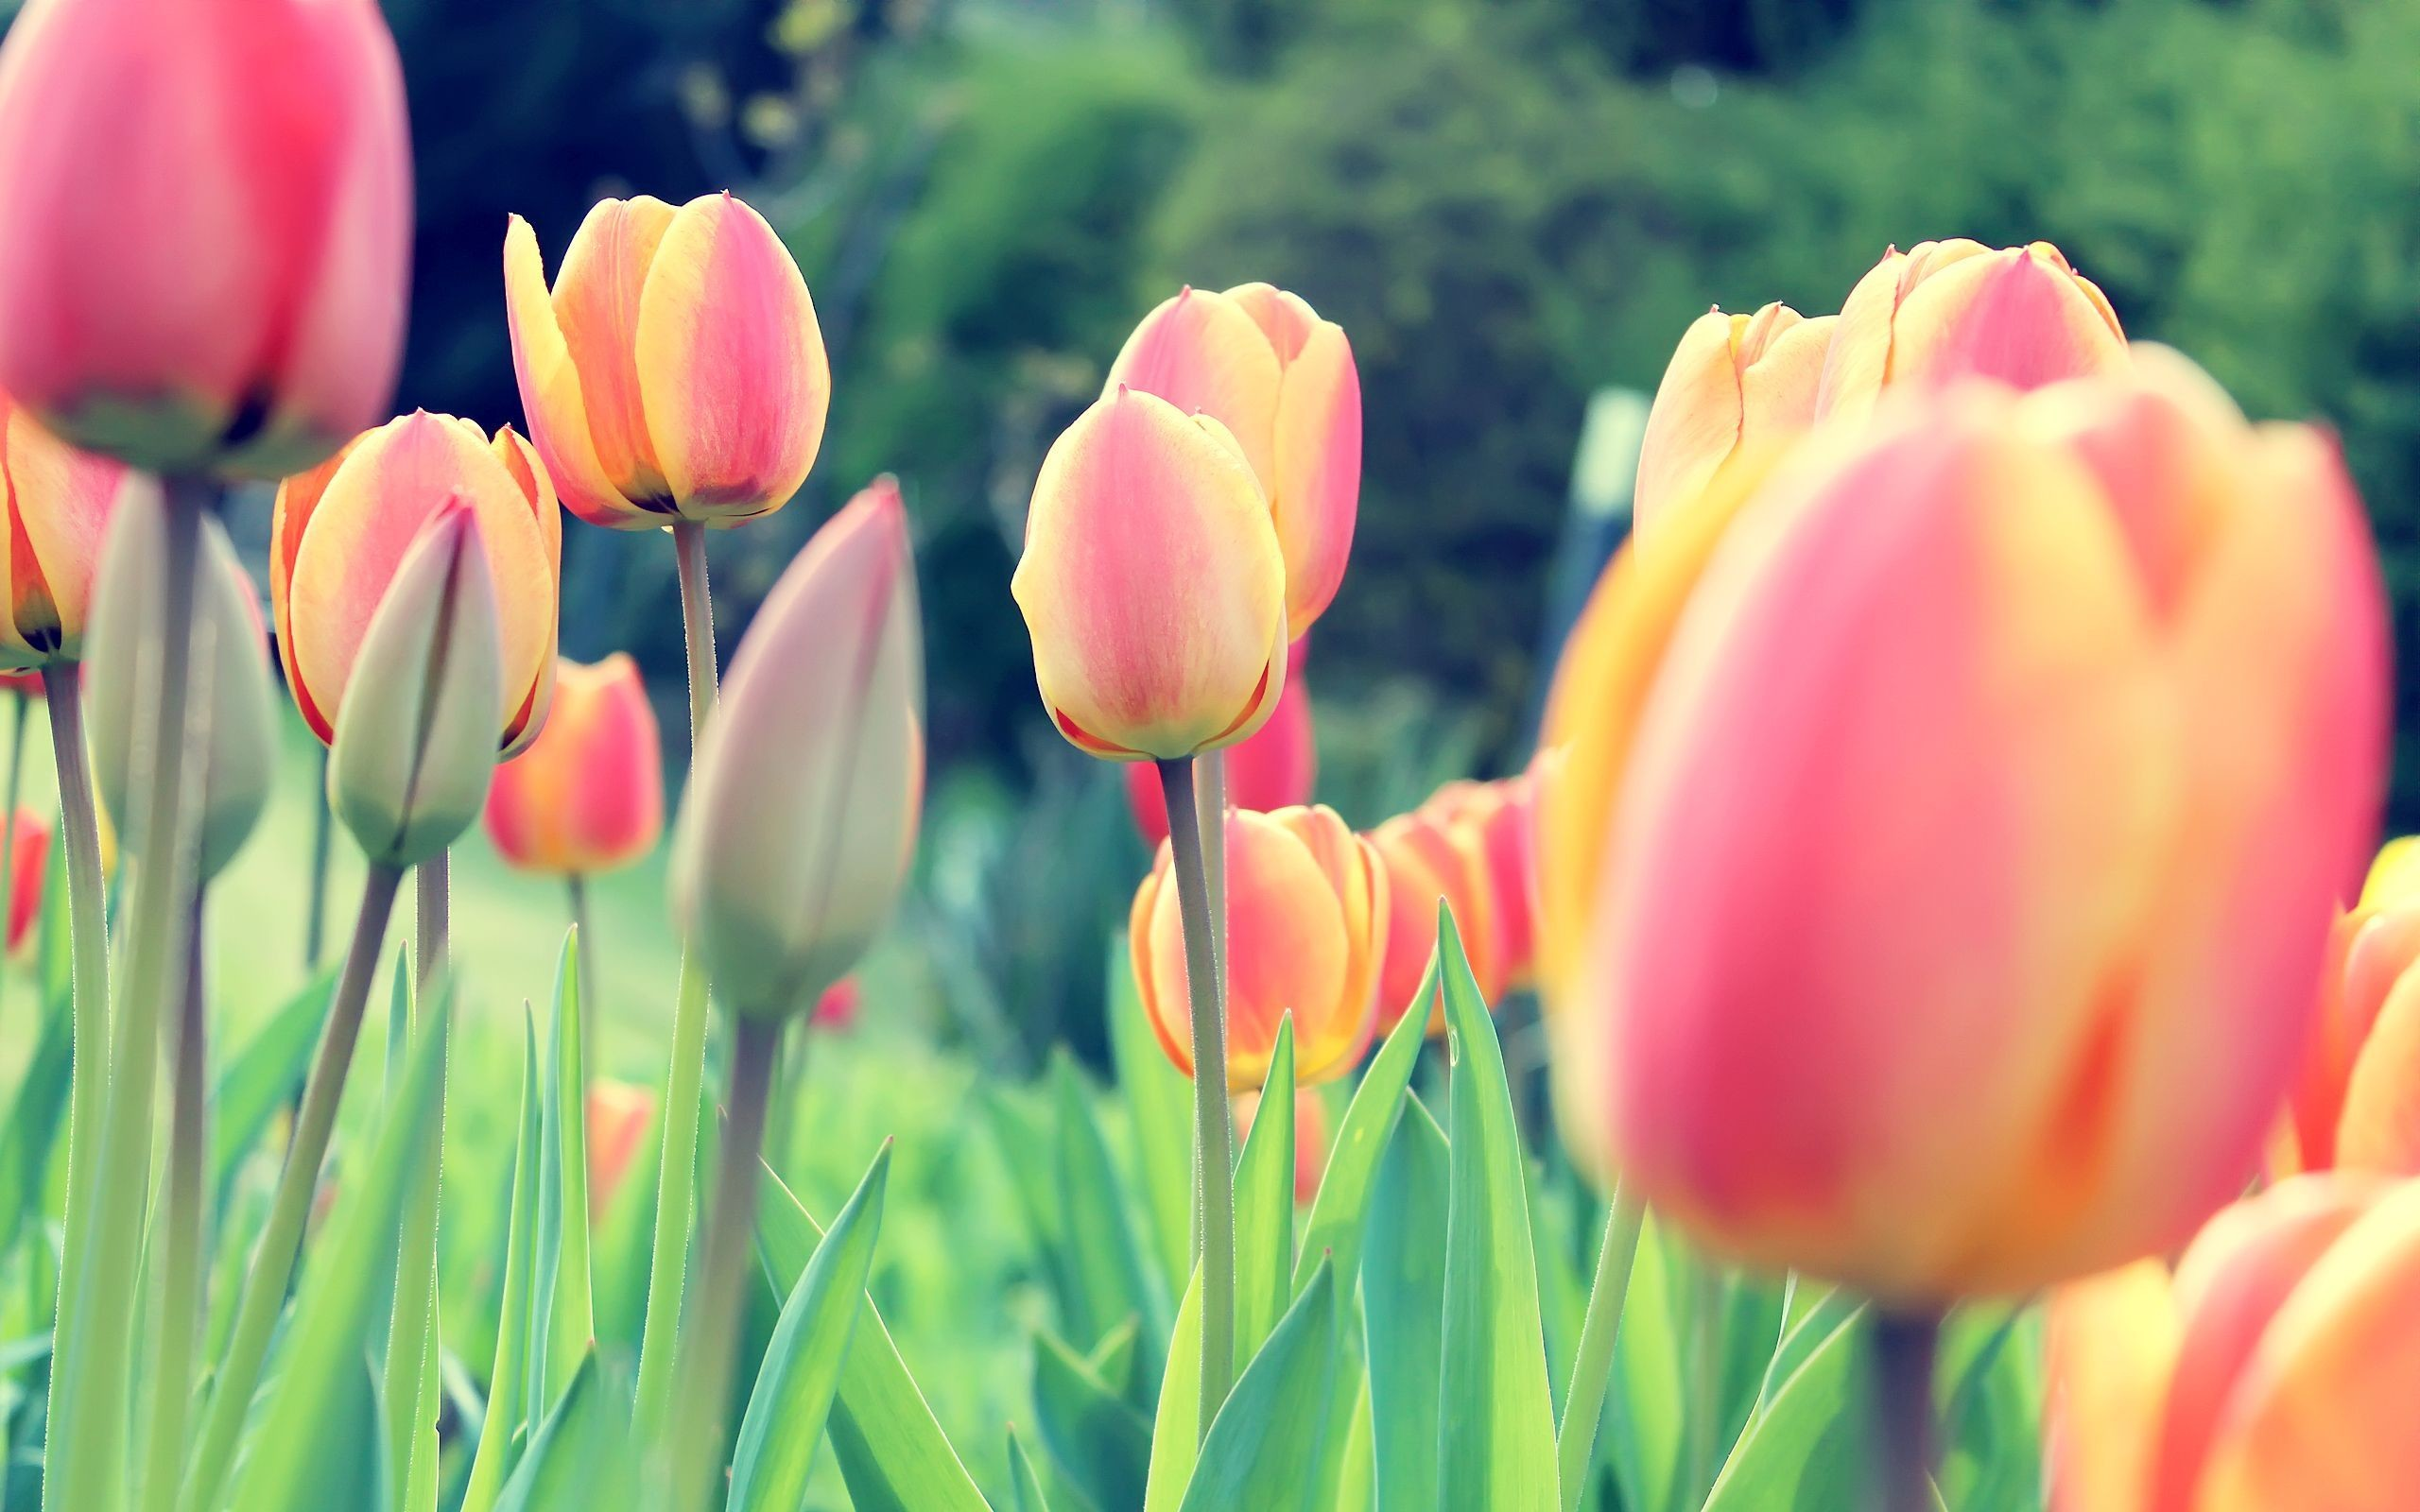 Res - 1920x1200, - Tulips Wallpaper For Desktop , HD Wallpaper & Backgrounds